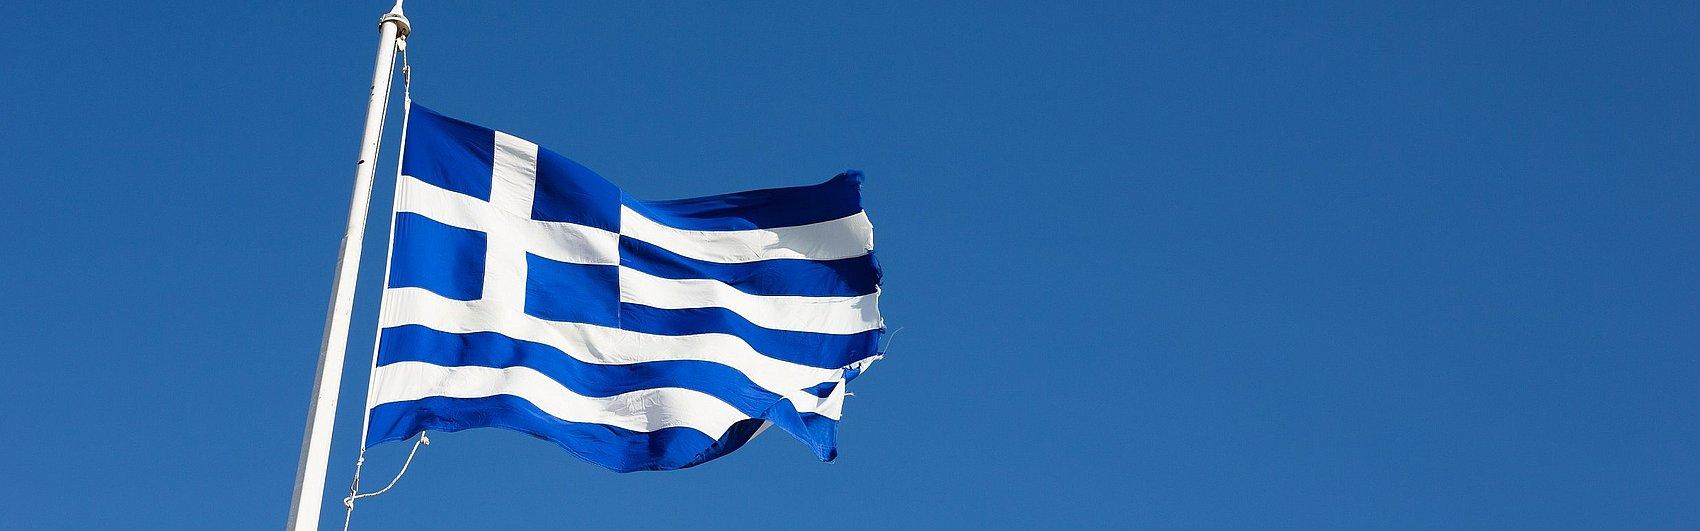 csm_Greece_9dc9e8e2da.jpg